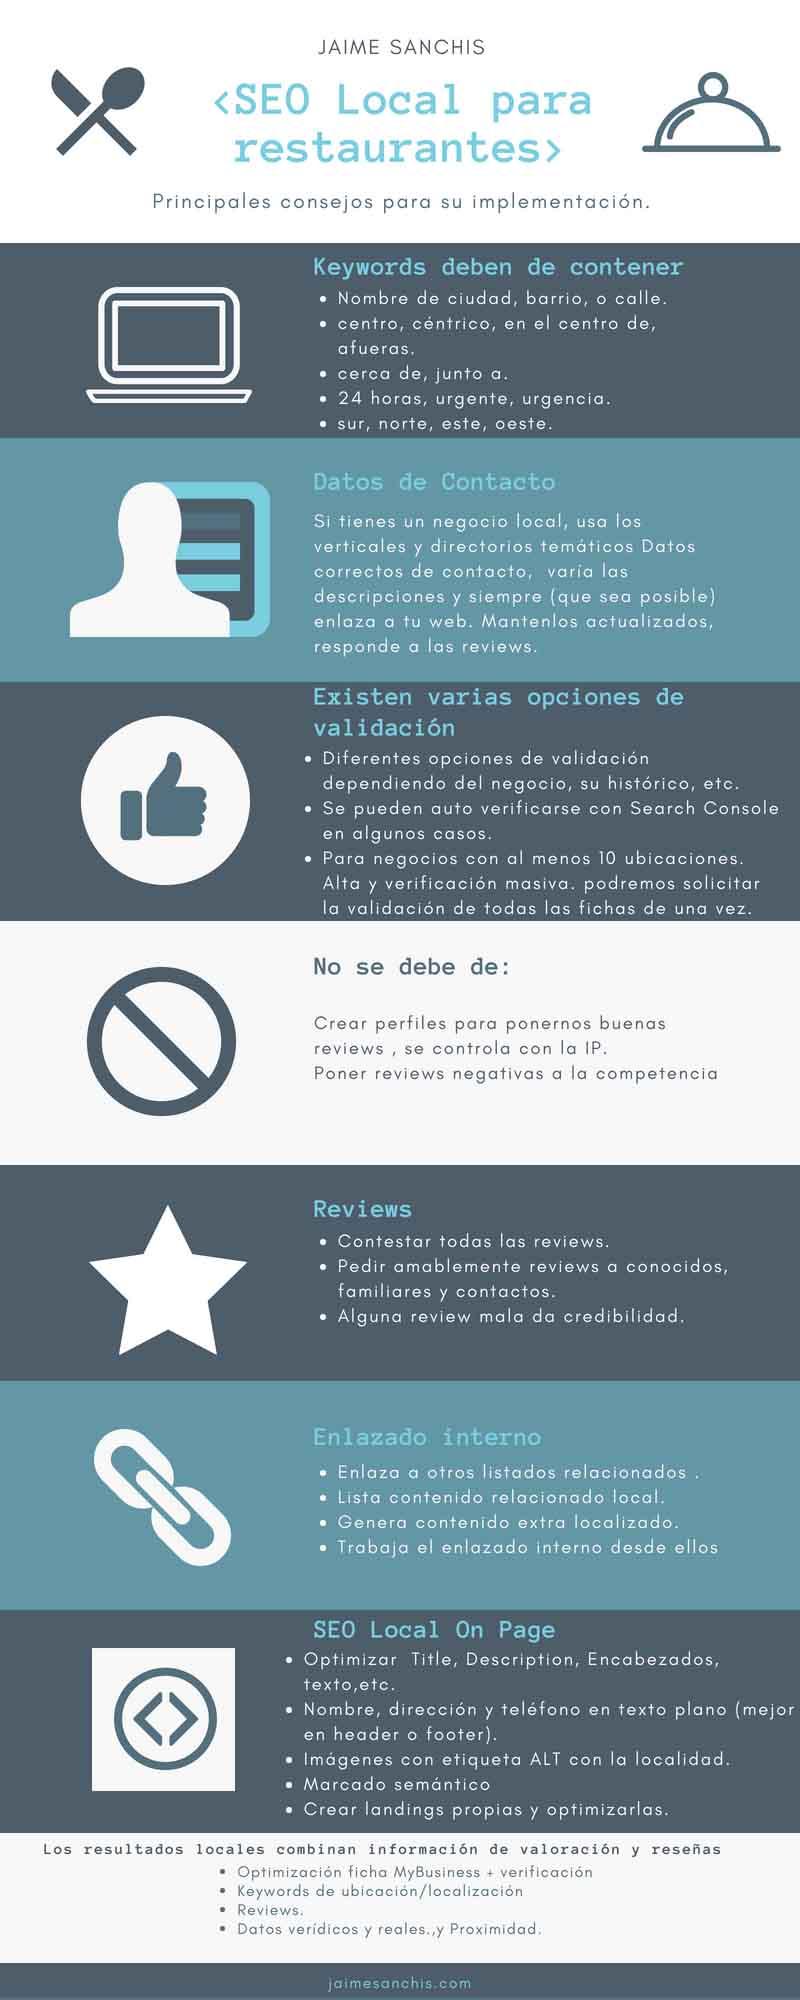 Infografía de la implementación de SEO Local para restaurantes